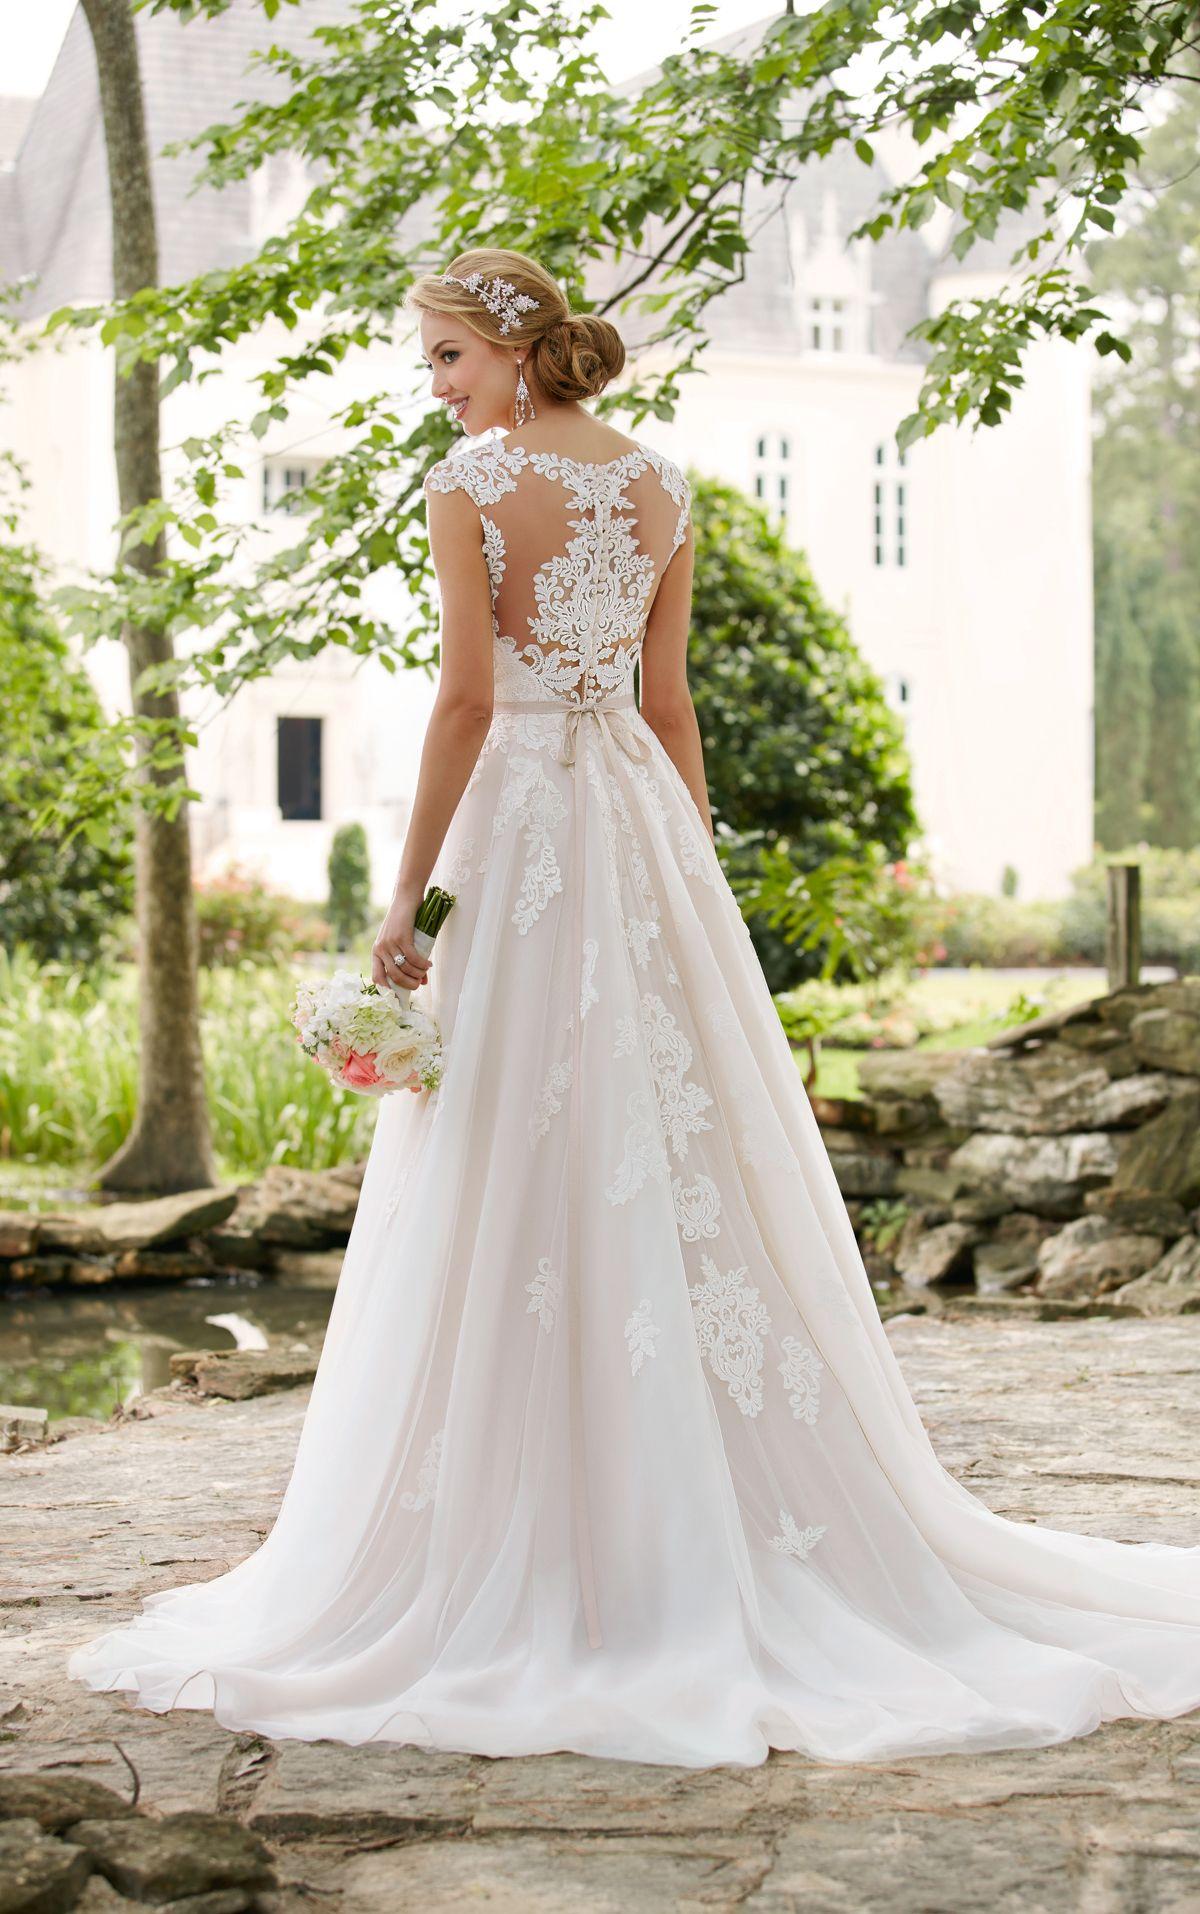 Romantic Cap Sleeve Wedding Dress With Cameo Back Stella York Romantic Wedding Dress Lace Wedding Dress Cap Sleeves Wedding Dresses